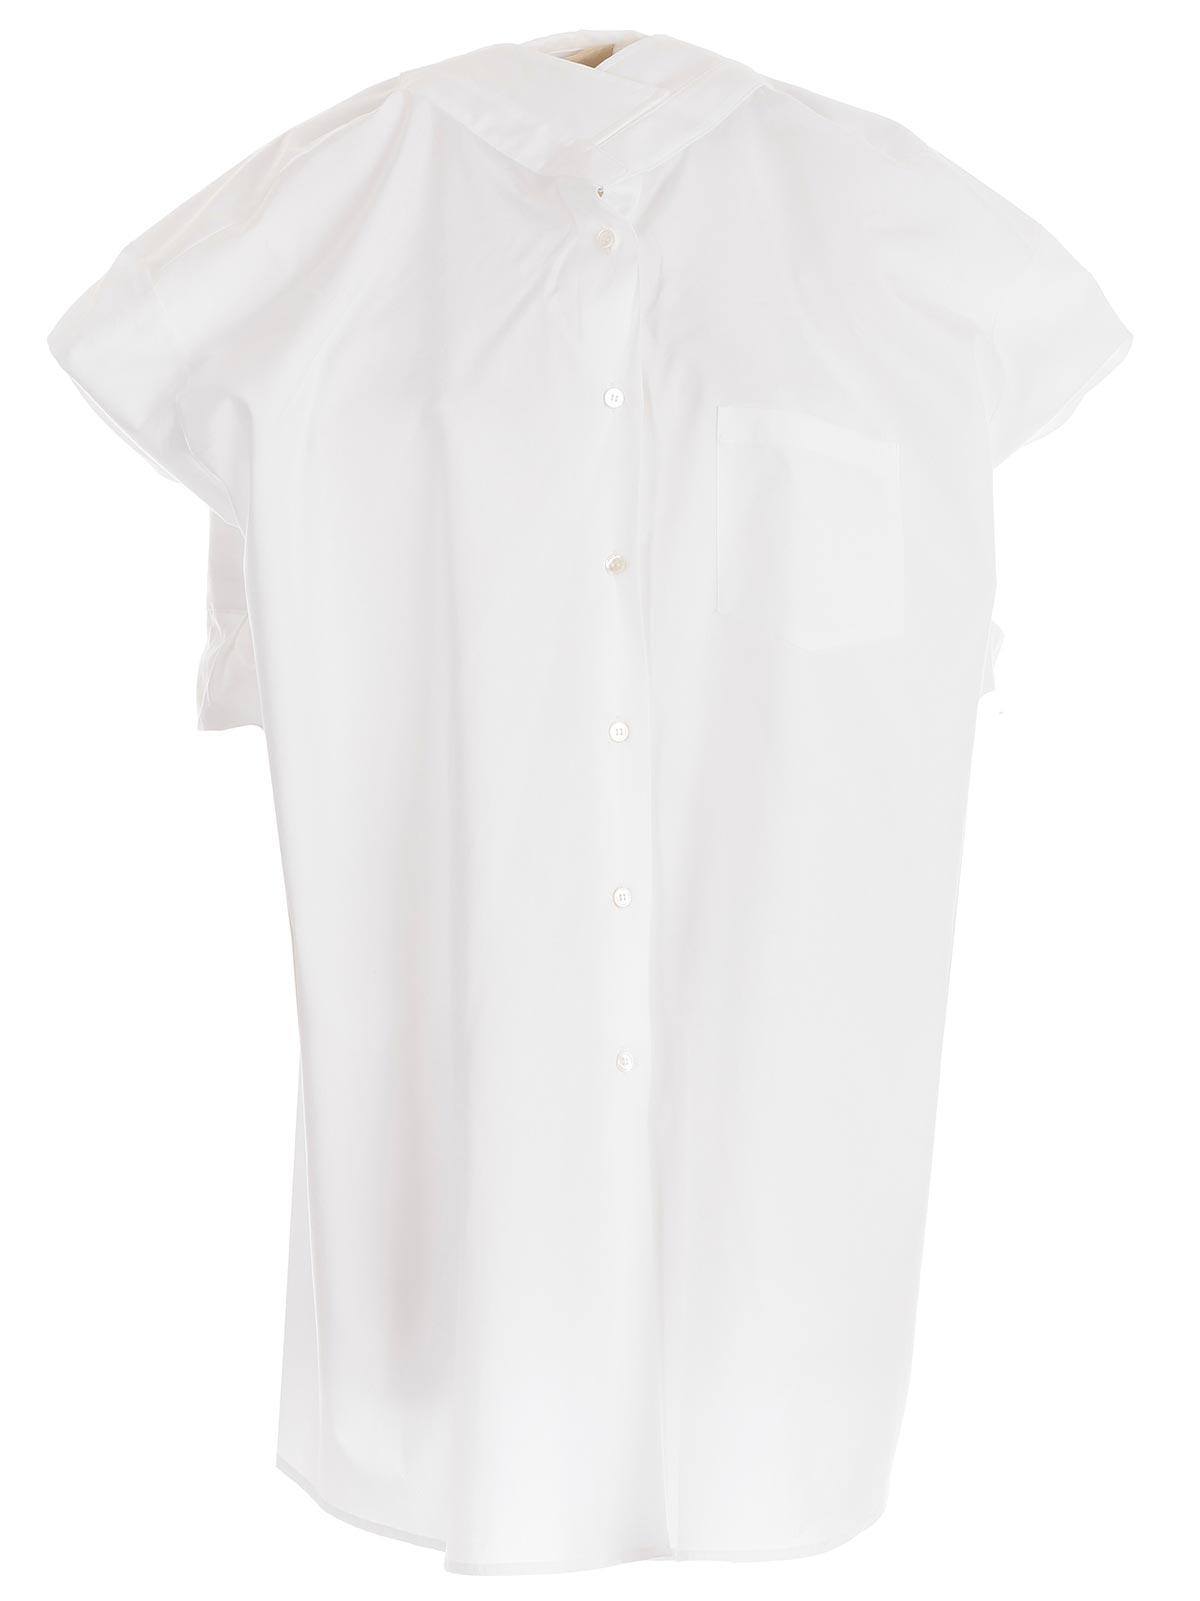 Picture of Erika Cavallini Shirts